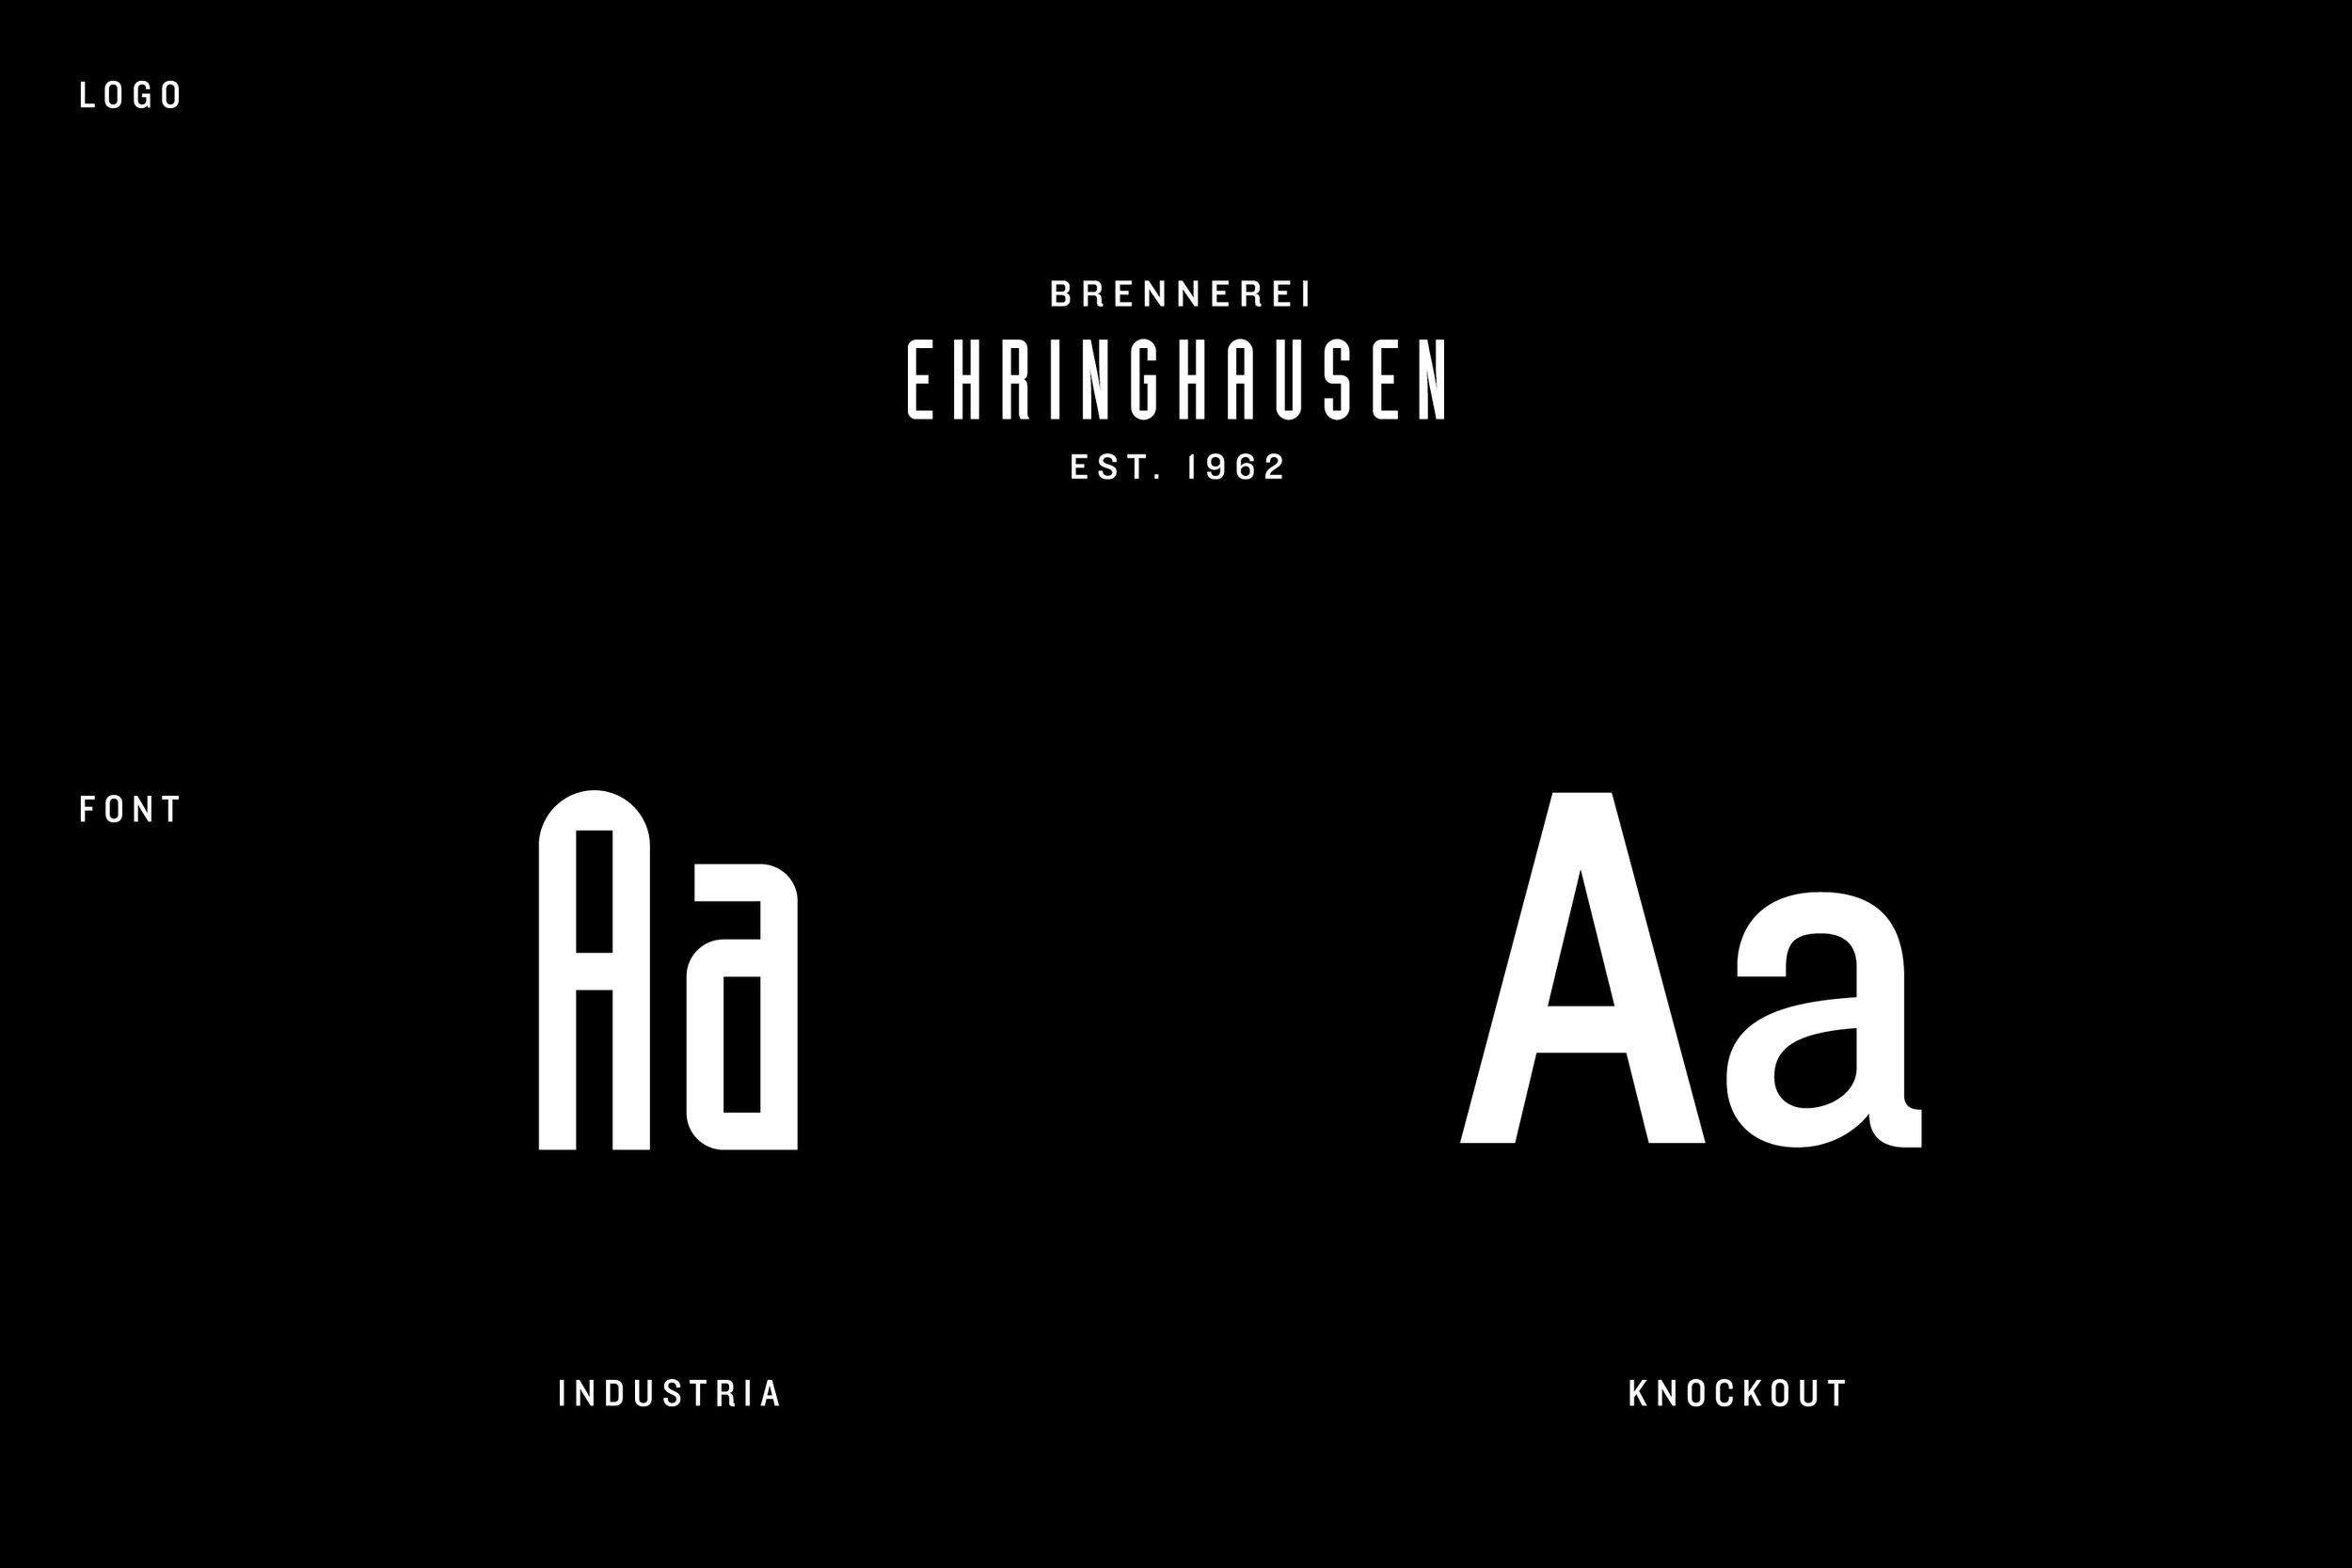 ffine-Brinkmann-Sonnenberg_Brennerei-Ehringhausen_Designsystem.jpg